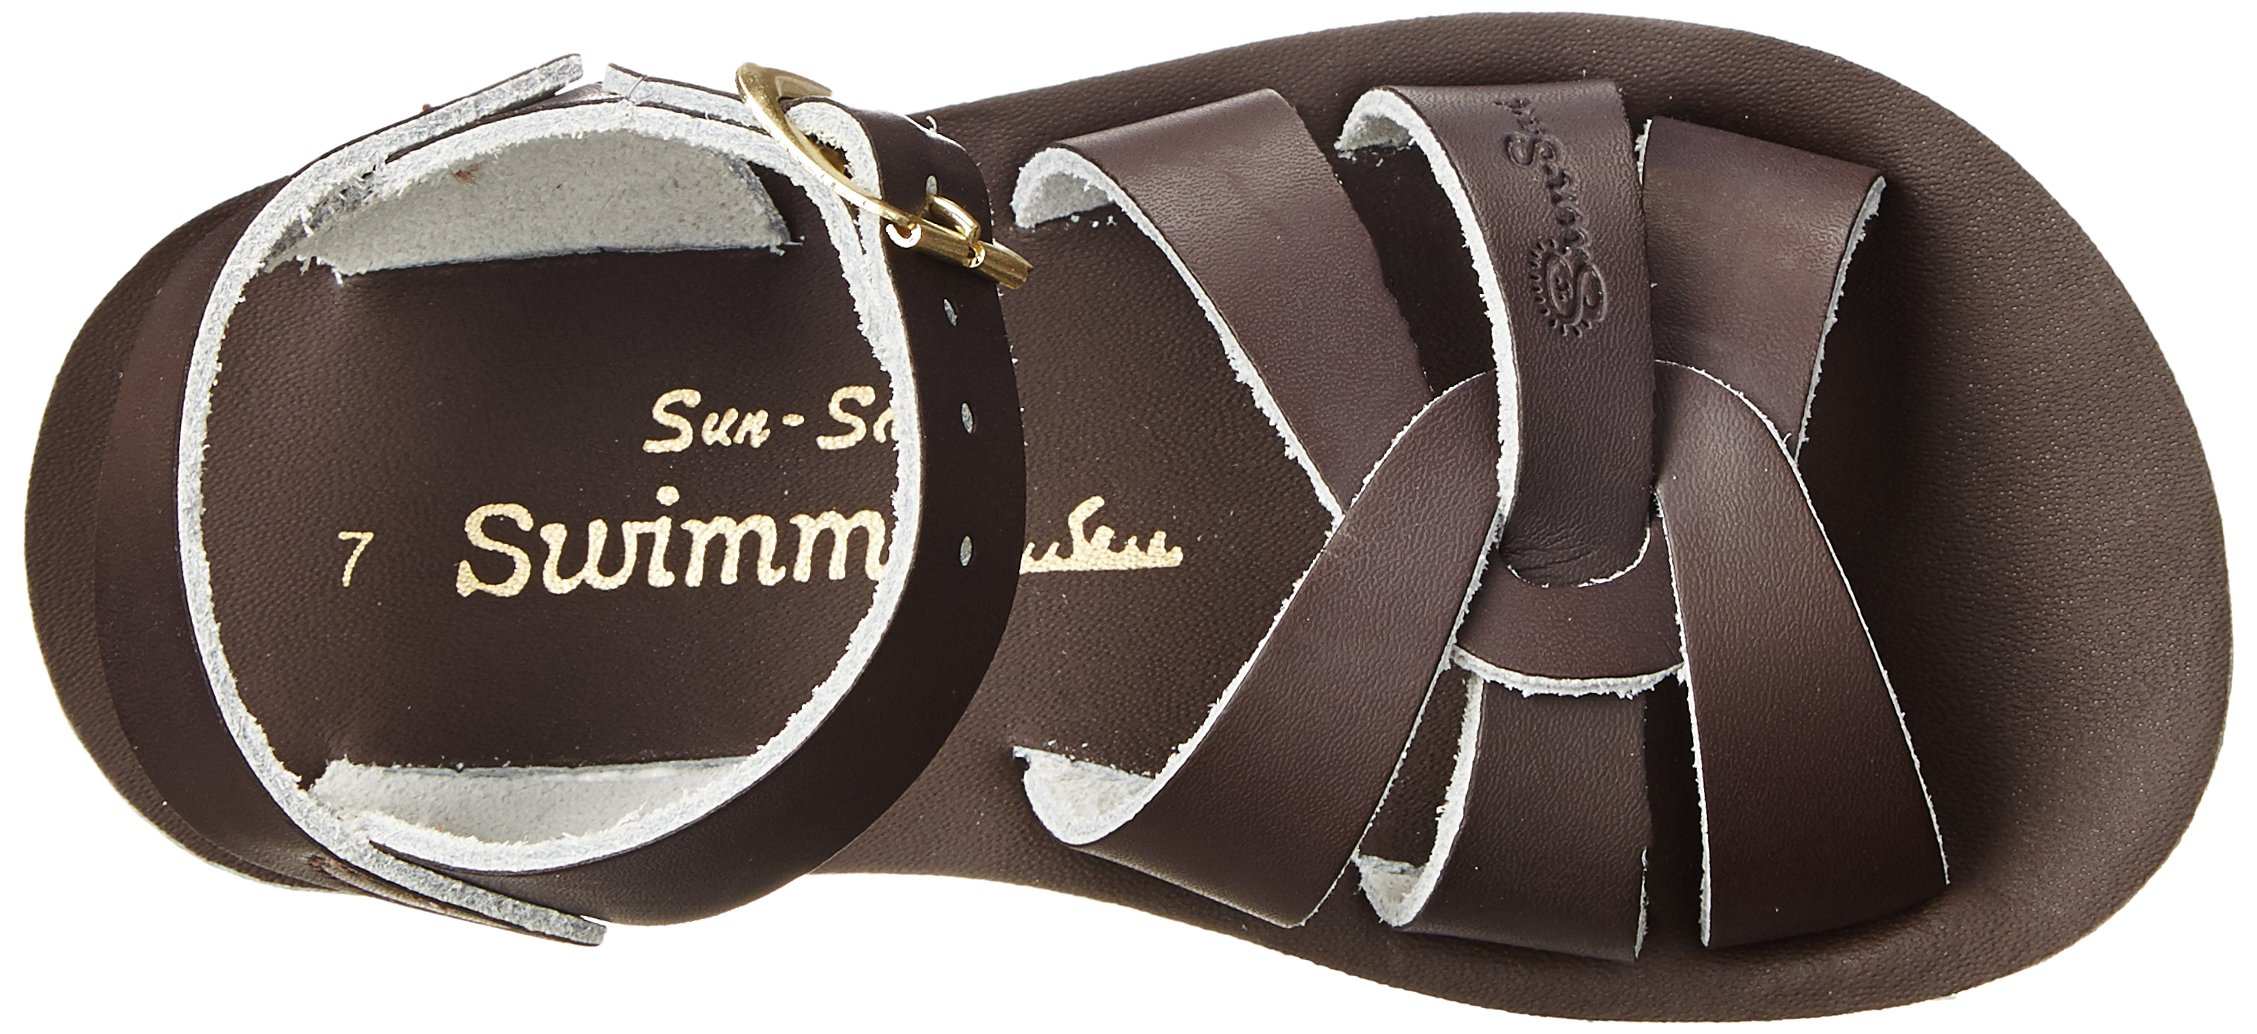 Salt Water Sandals by Hoy Shoe Sun-San Swimmer Kid - Brown - Little Kid Swimmer 1 - 8002-BROWN-1 6e79d4